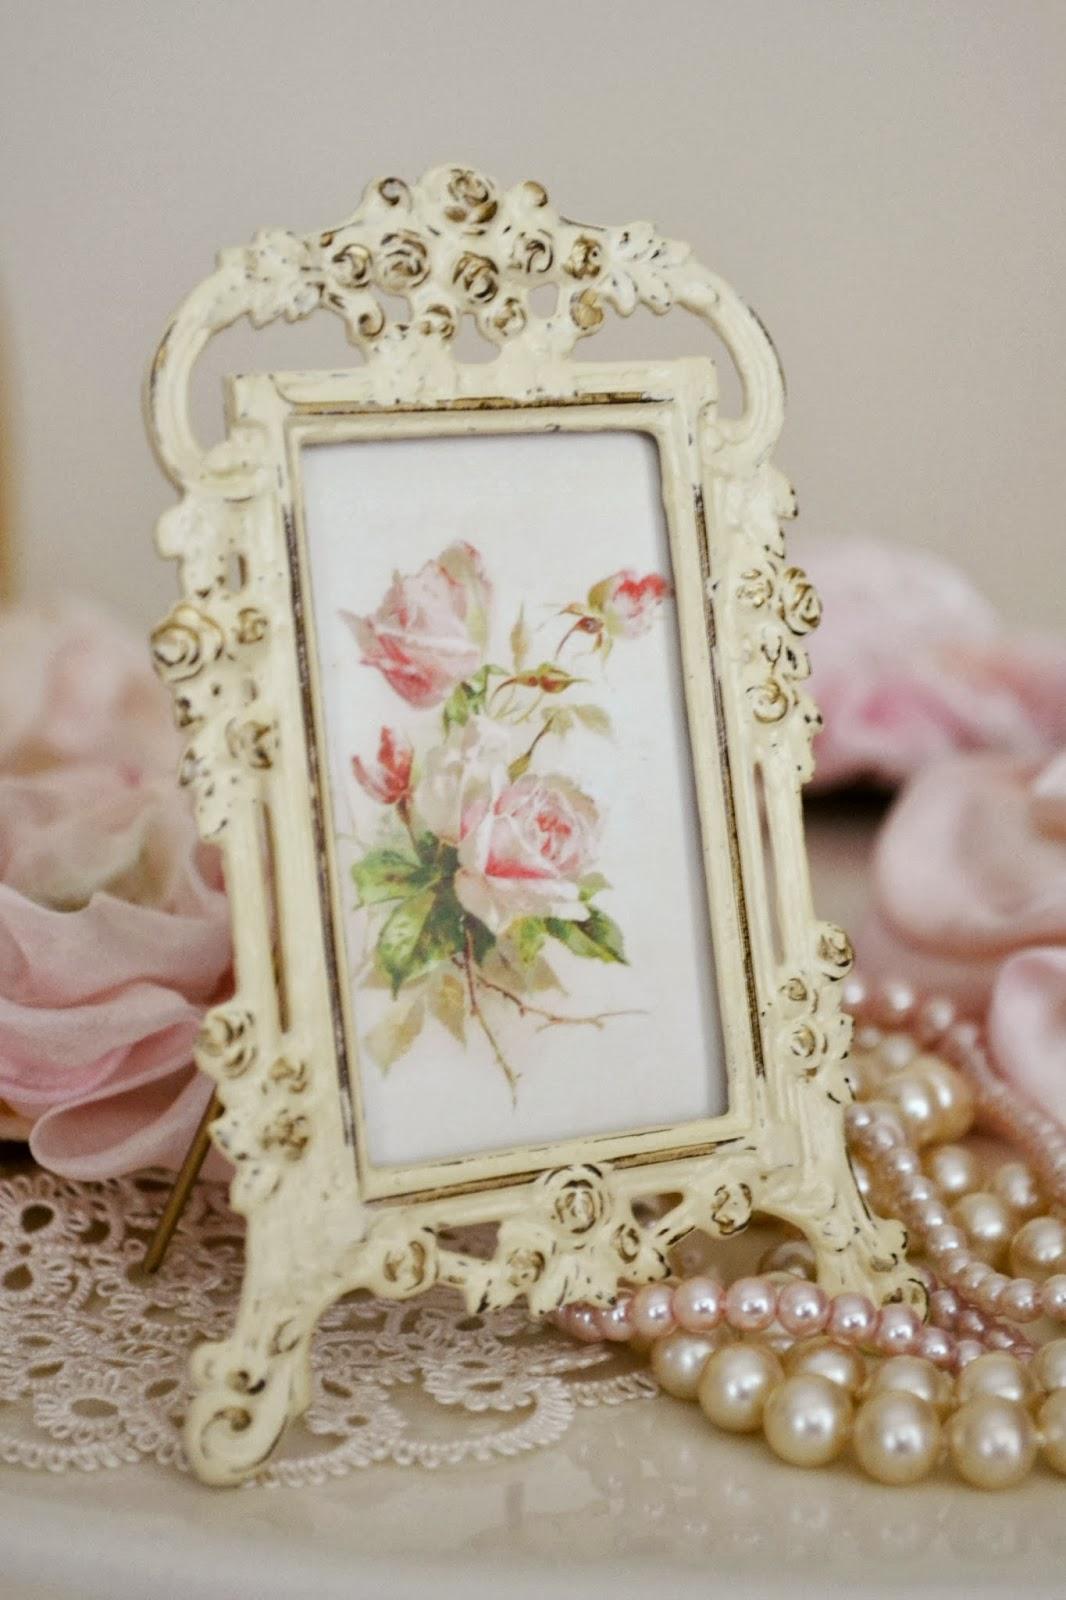 jennelise porcelain picture frames and pretties. Black Bedroom Furniture Sets. Home Design Ideas